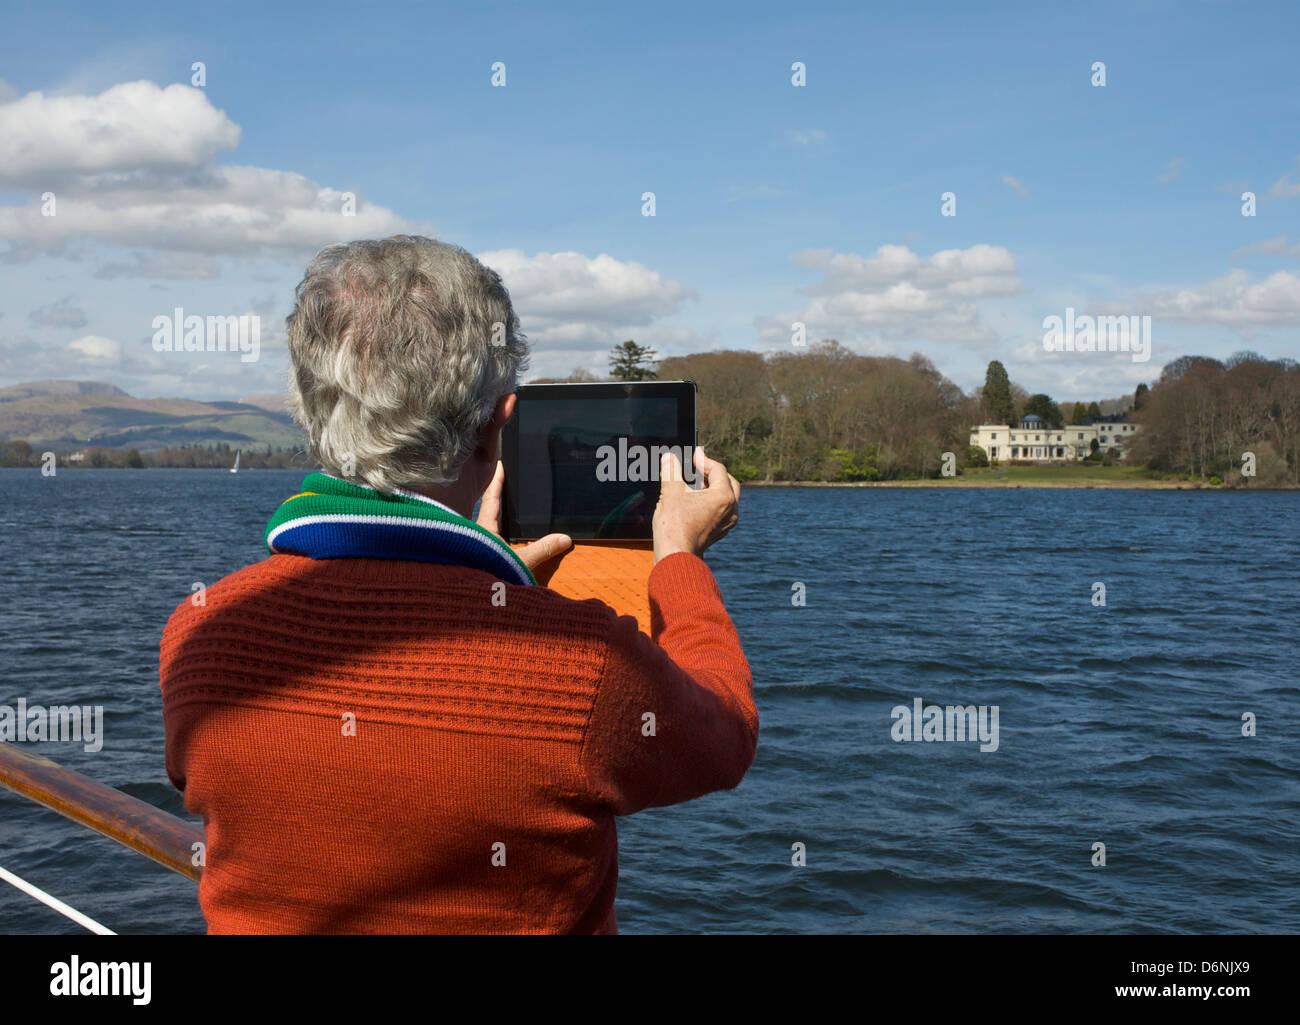 Man taking photograph avec son iPad, le lac Windermere, Parc National de Lake District, Cumbria, Angleterre, Royaume Photo Stock